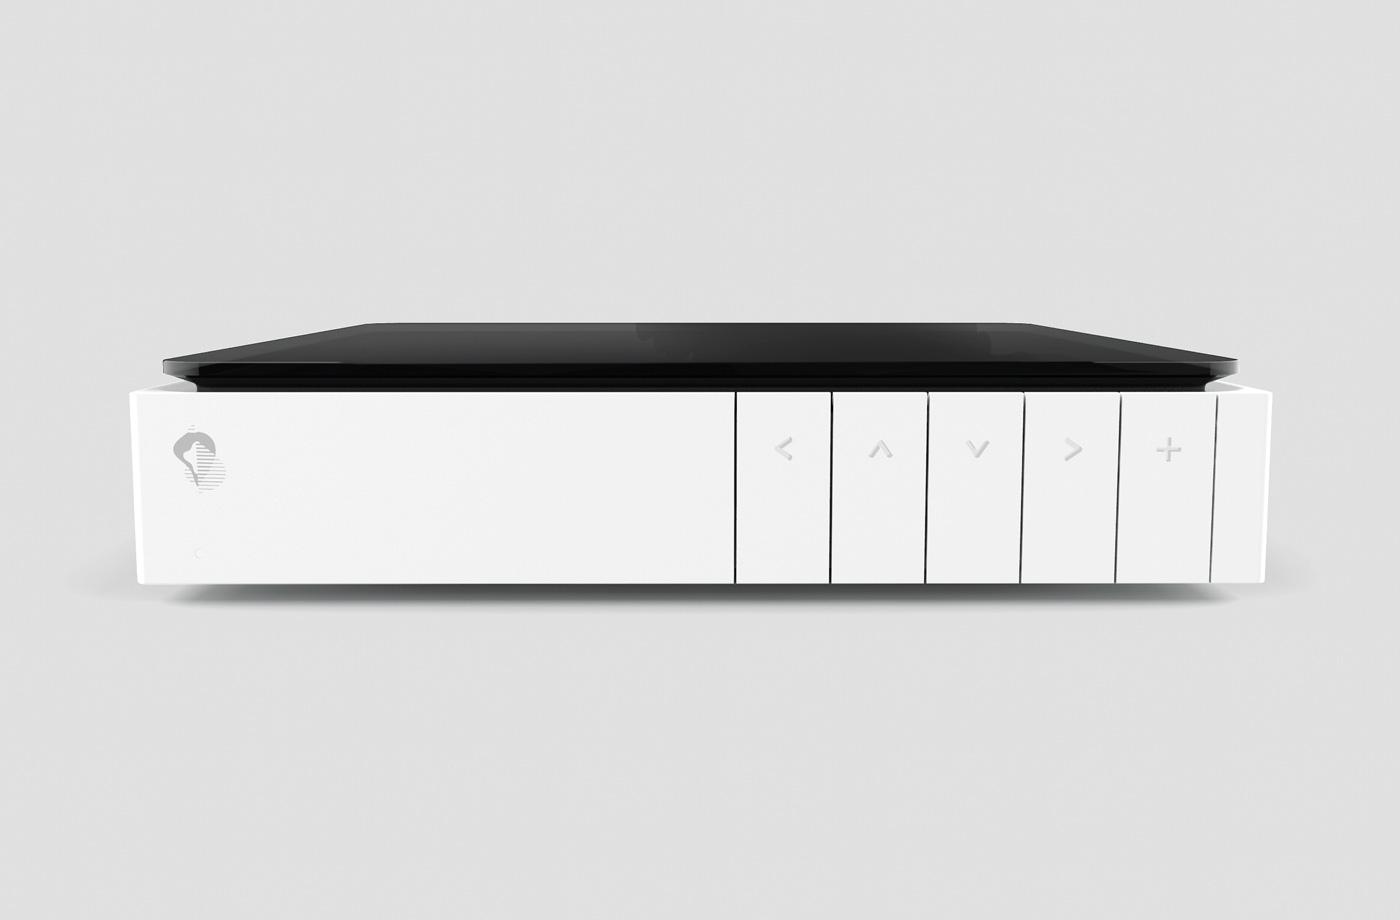 swisscom internet box industrial design